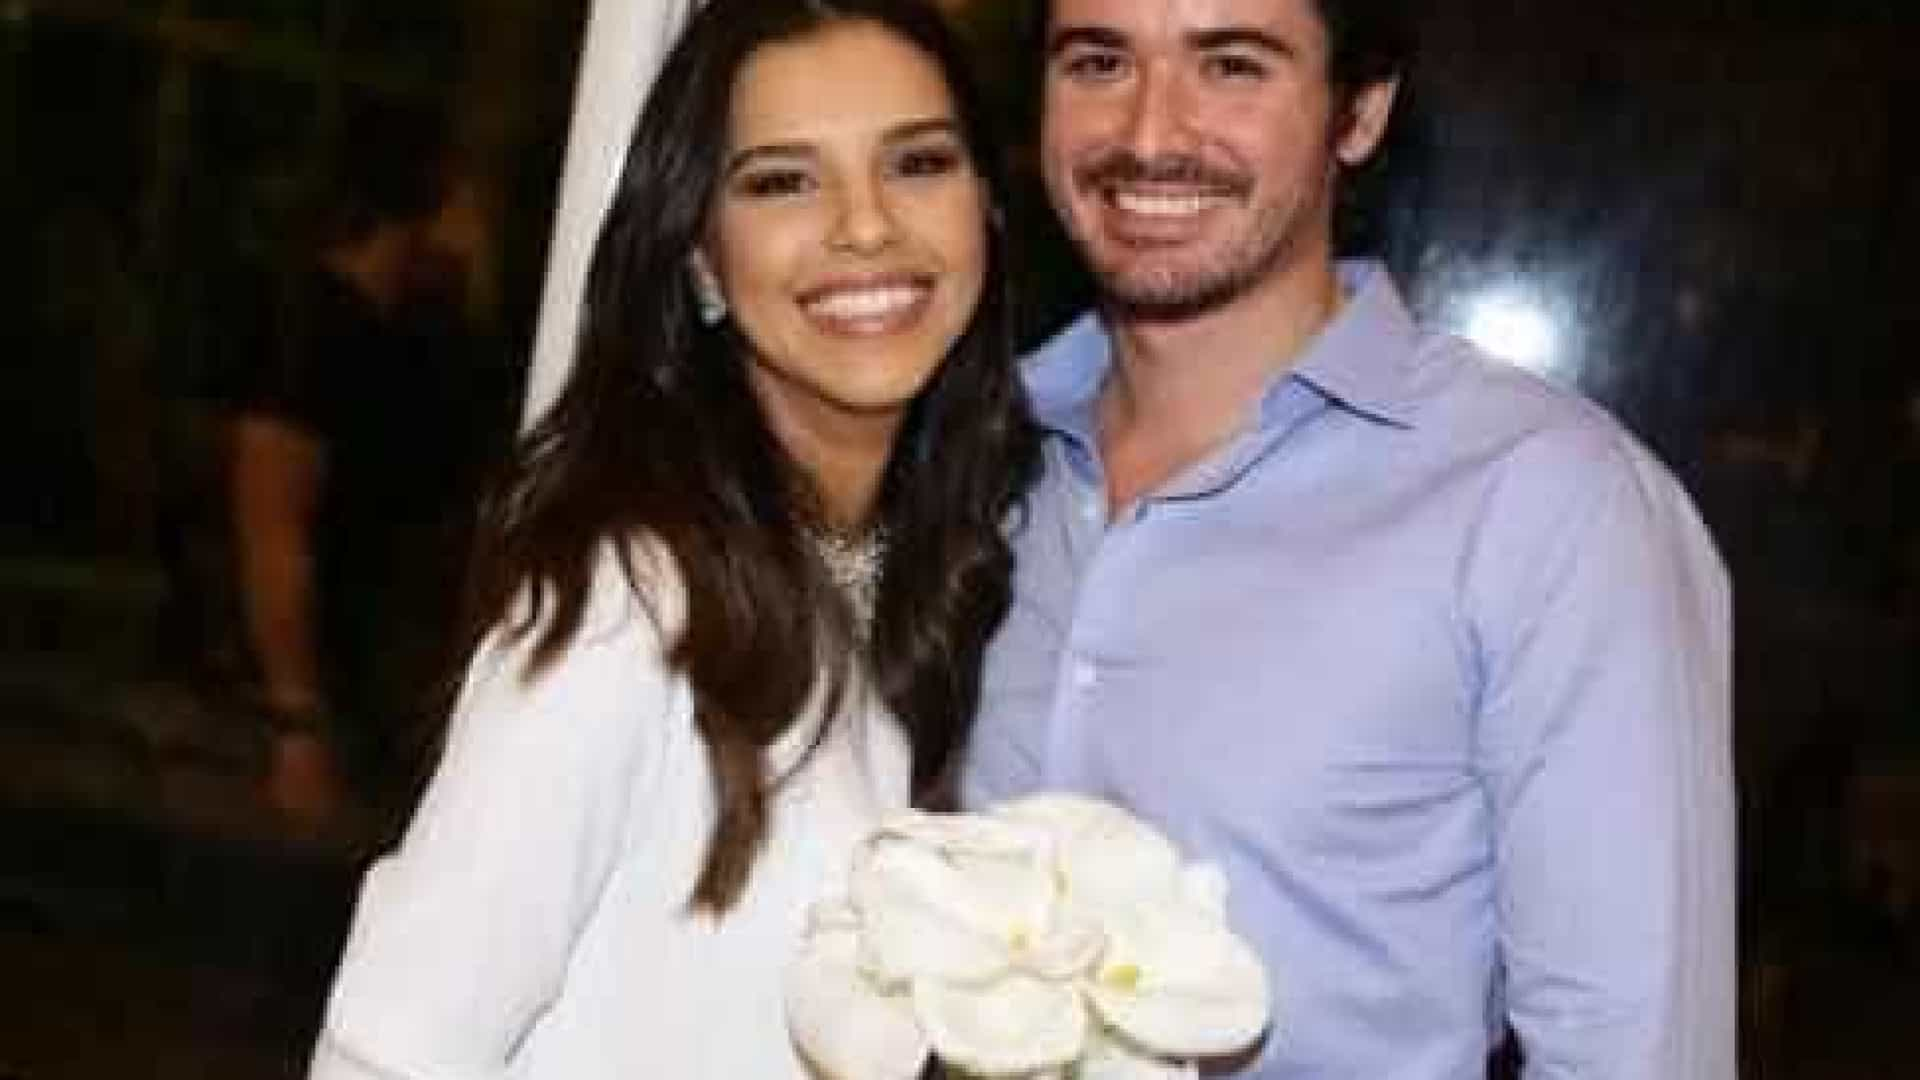 Namoro da atriz Mariana Rios chega ao fim após o carnaval